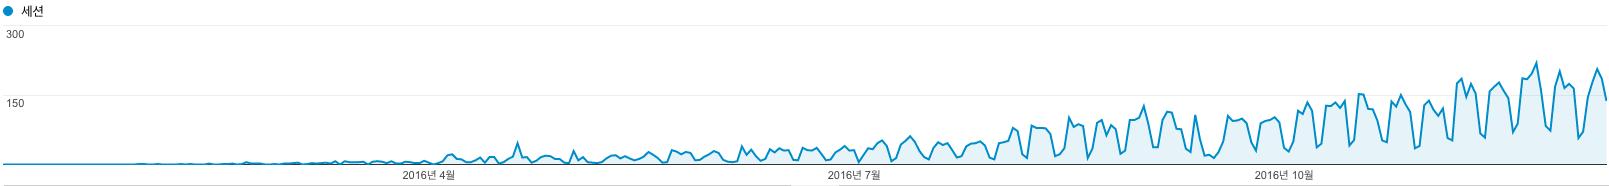 Google Anaytics 검색 유입 통계 2016